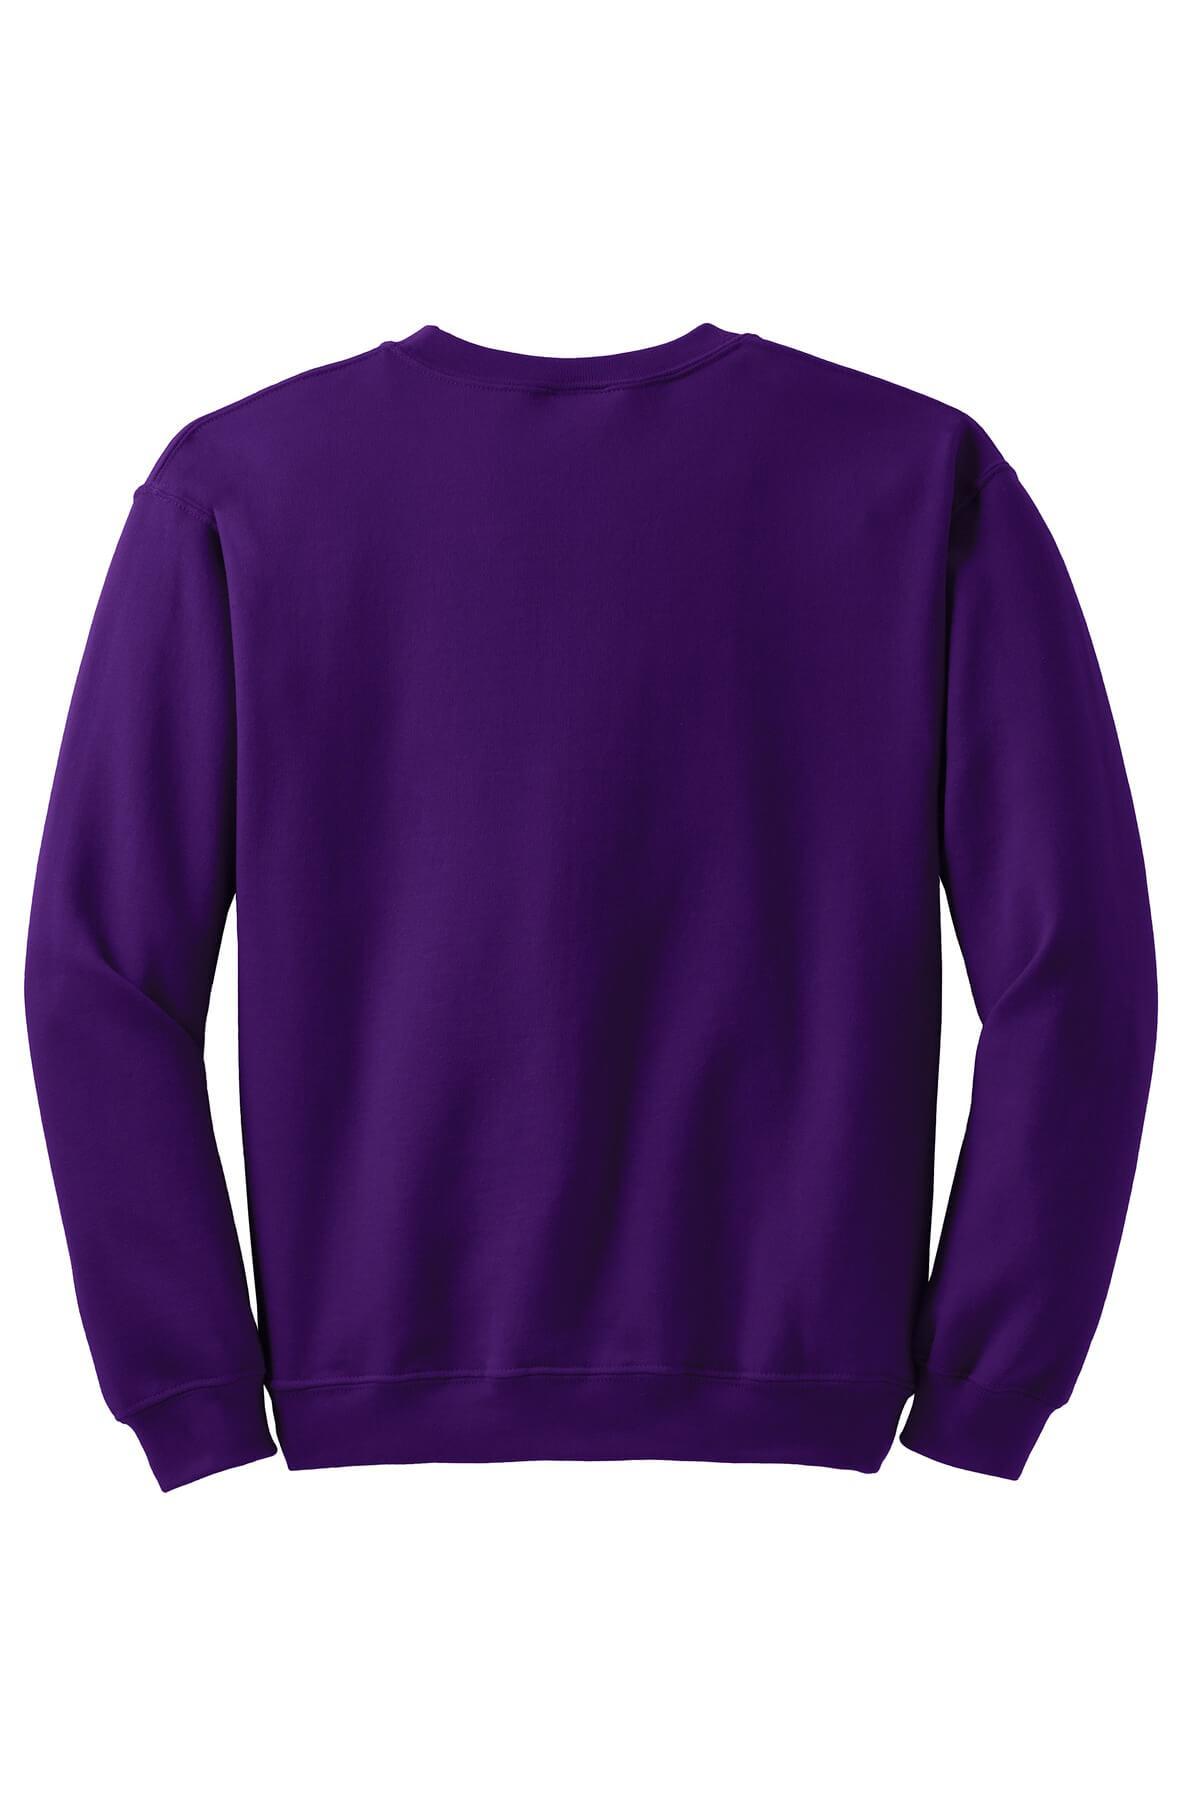 18000-purple-6